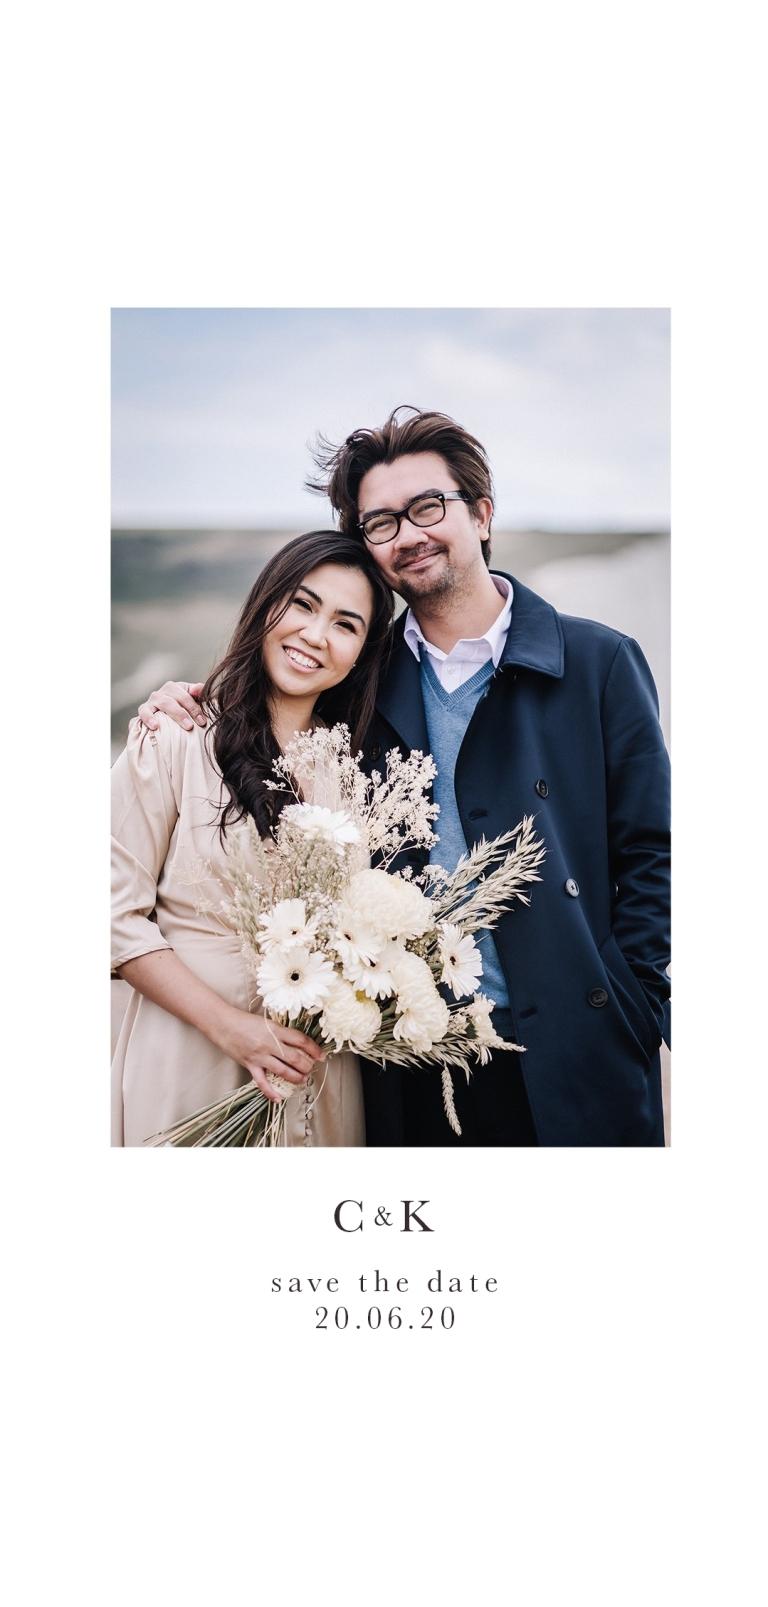 Chris and Karen JPG 13